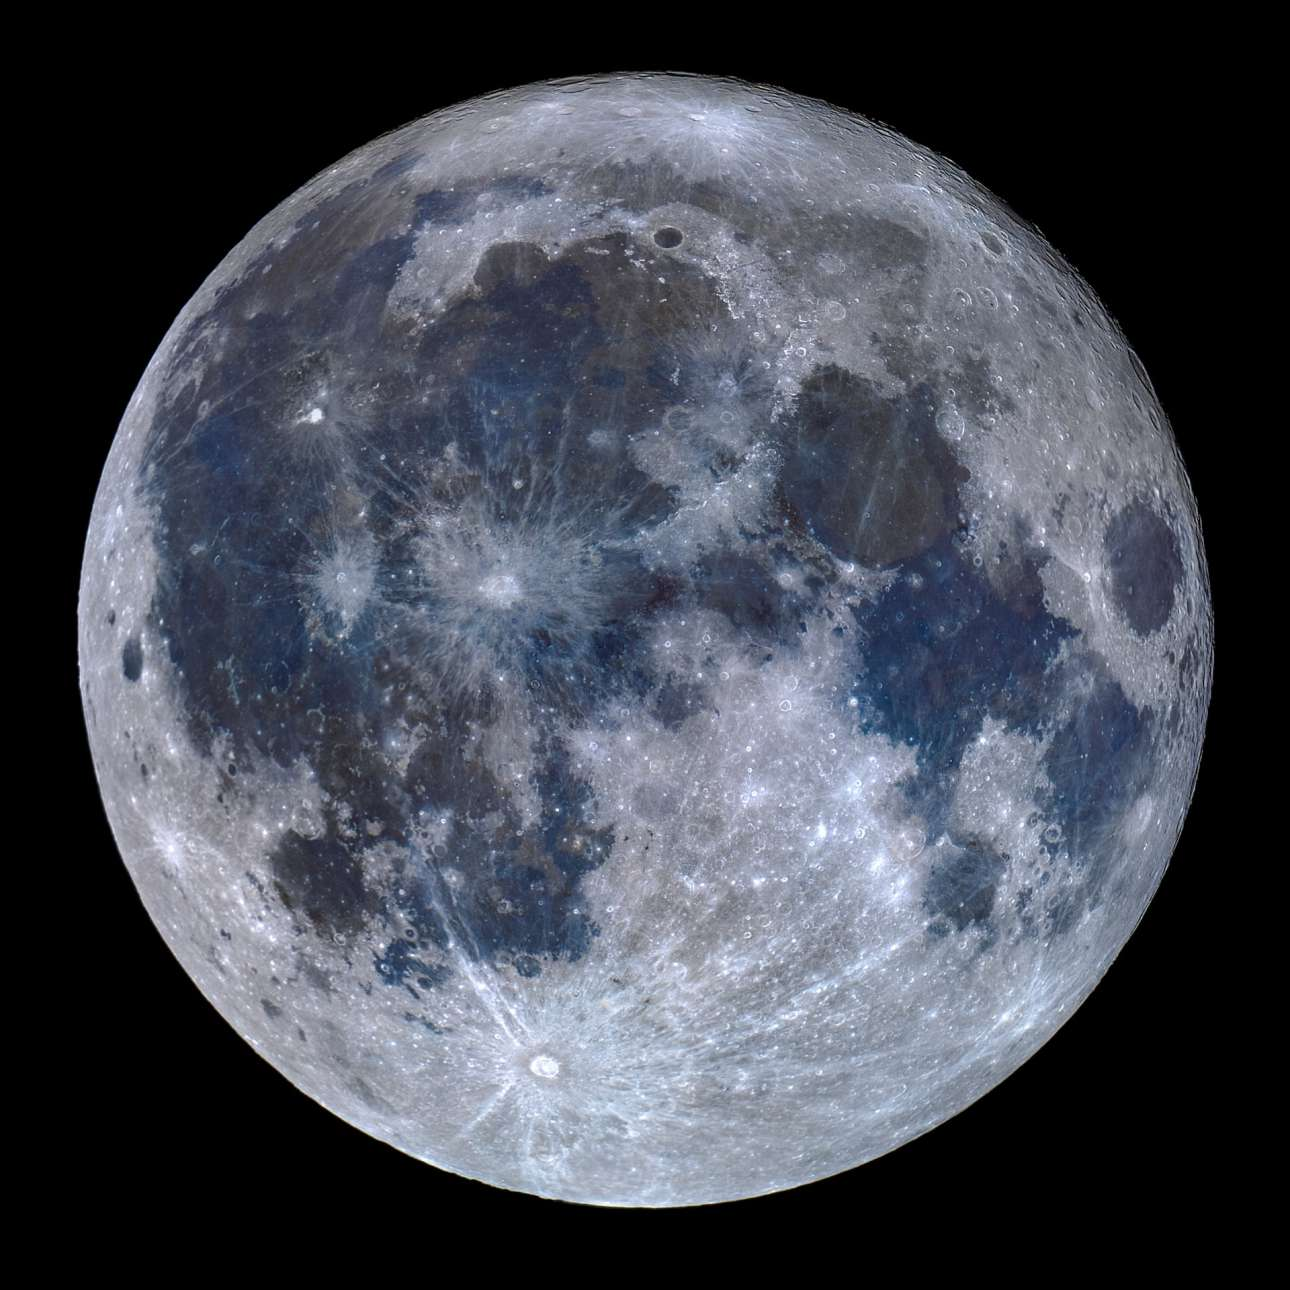 O Μιγκέλ Κλάρο από την Πορτογαλία κατέγραψε μια εντυπωσιακή εικόνα της επιφάνειας της Σελήνης ενισχύοντας λίγο τα χρώματα της ώστε να αποτυπωθεί με την μεγαλύτερη δυνατή ακρίβεια η πραγματική της όψη. Οι διαφορές στην χημική σύνθεση της επιφάνειας του φυσικού μας δορυφόρου και οι μεταβολές στα μεταλλικά της στοιχεία παράγουν χρωματικές  διαφοροποιήσεις στο αντανακλώμενο φως της. Οι γαλάζια απόχρωση σε διάφορες περιοχές υποδεικνύουν την έντονη παρουσία τιτανίου εκεί